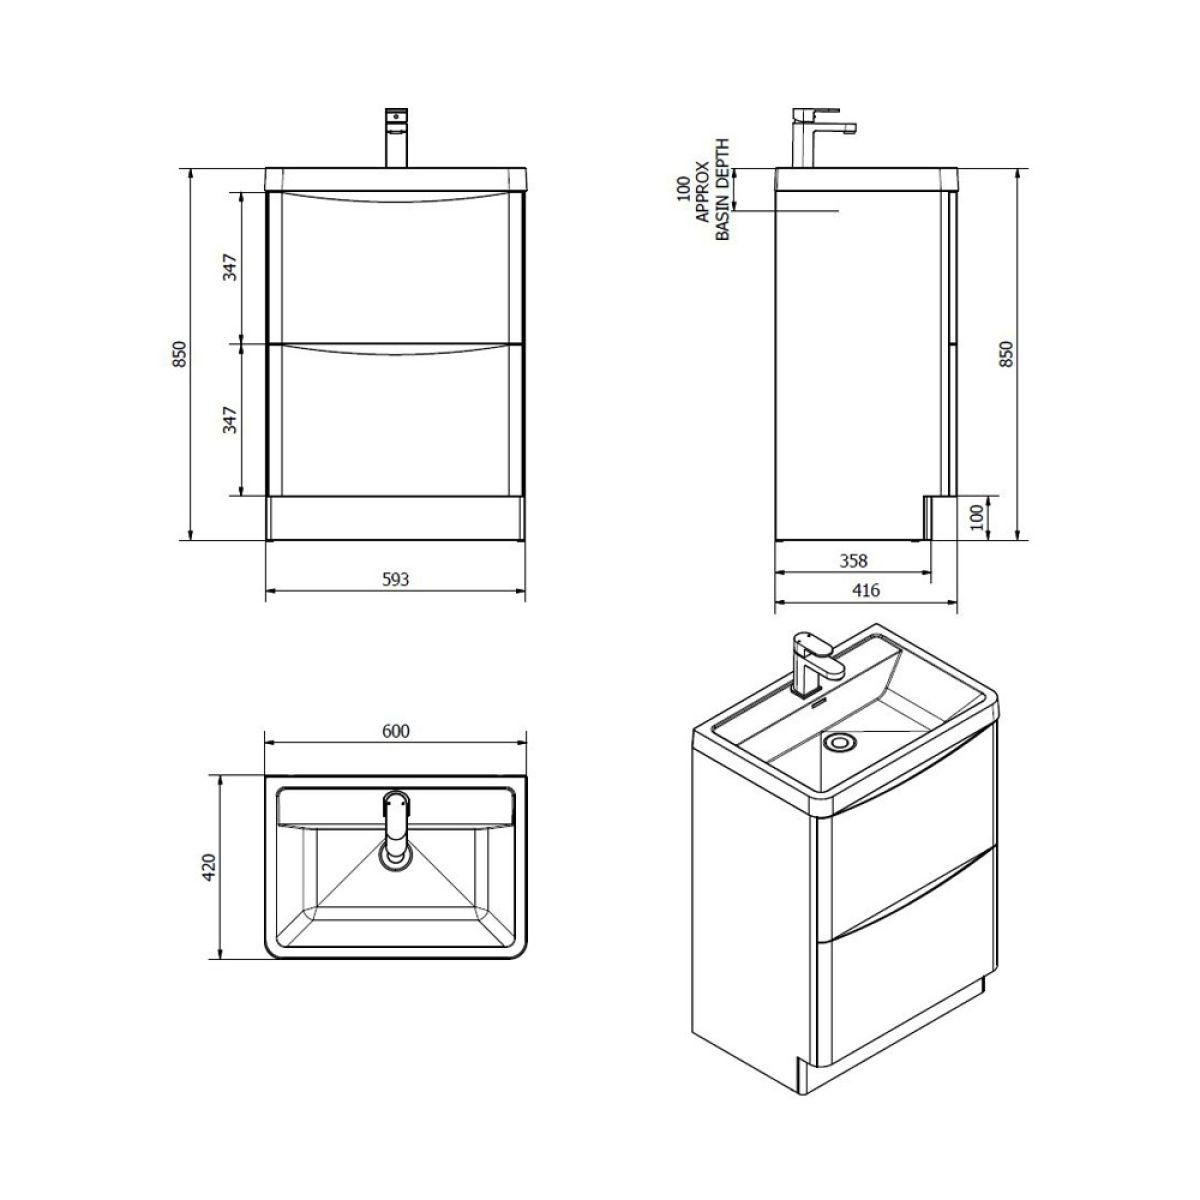 Bali Matt Grey Floor Standing Vanity Unit 600mm Dimensions